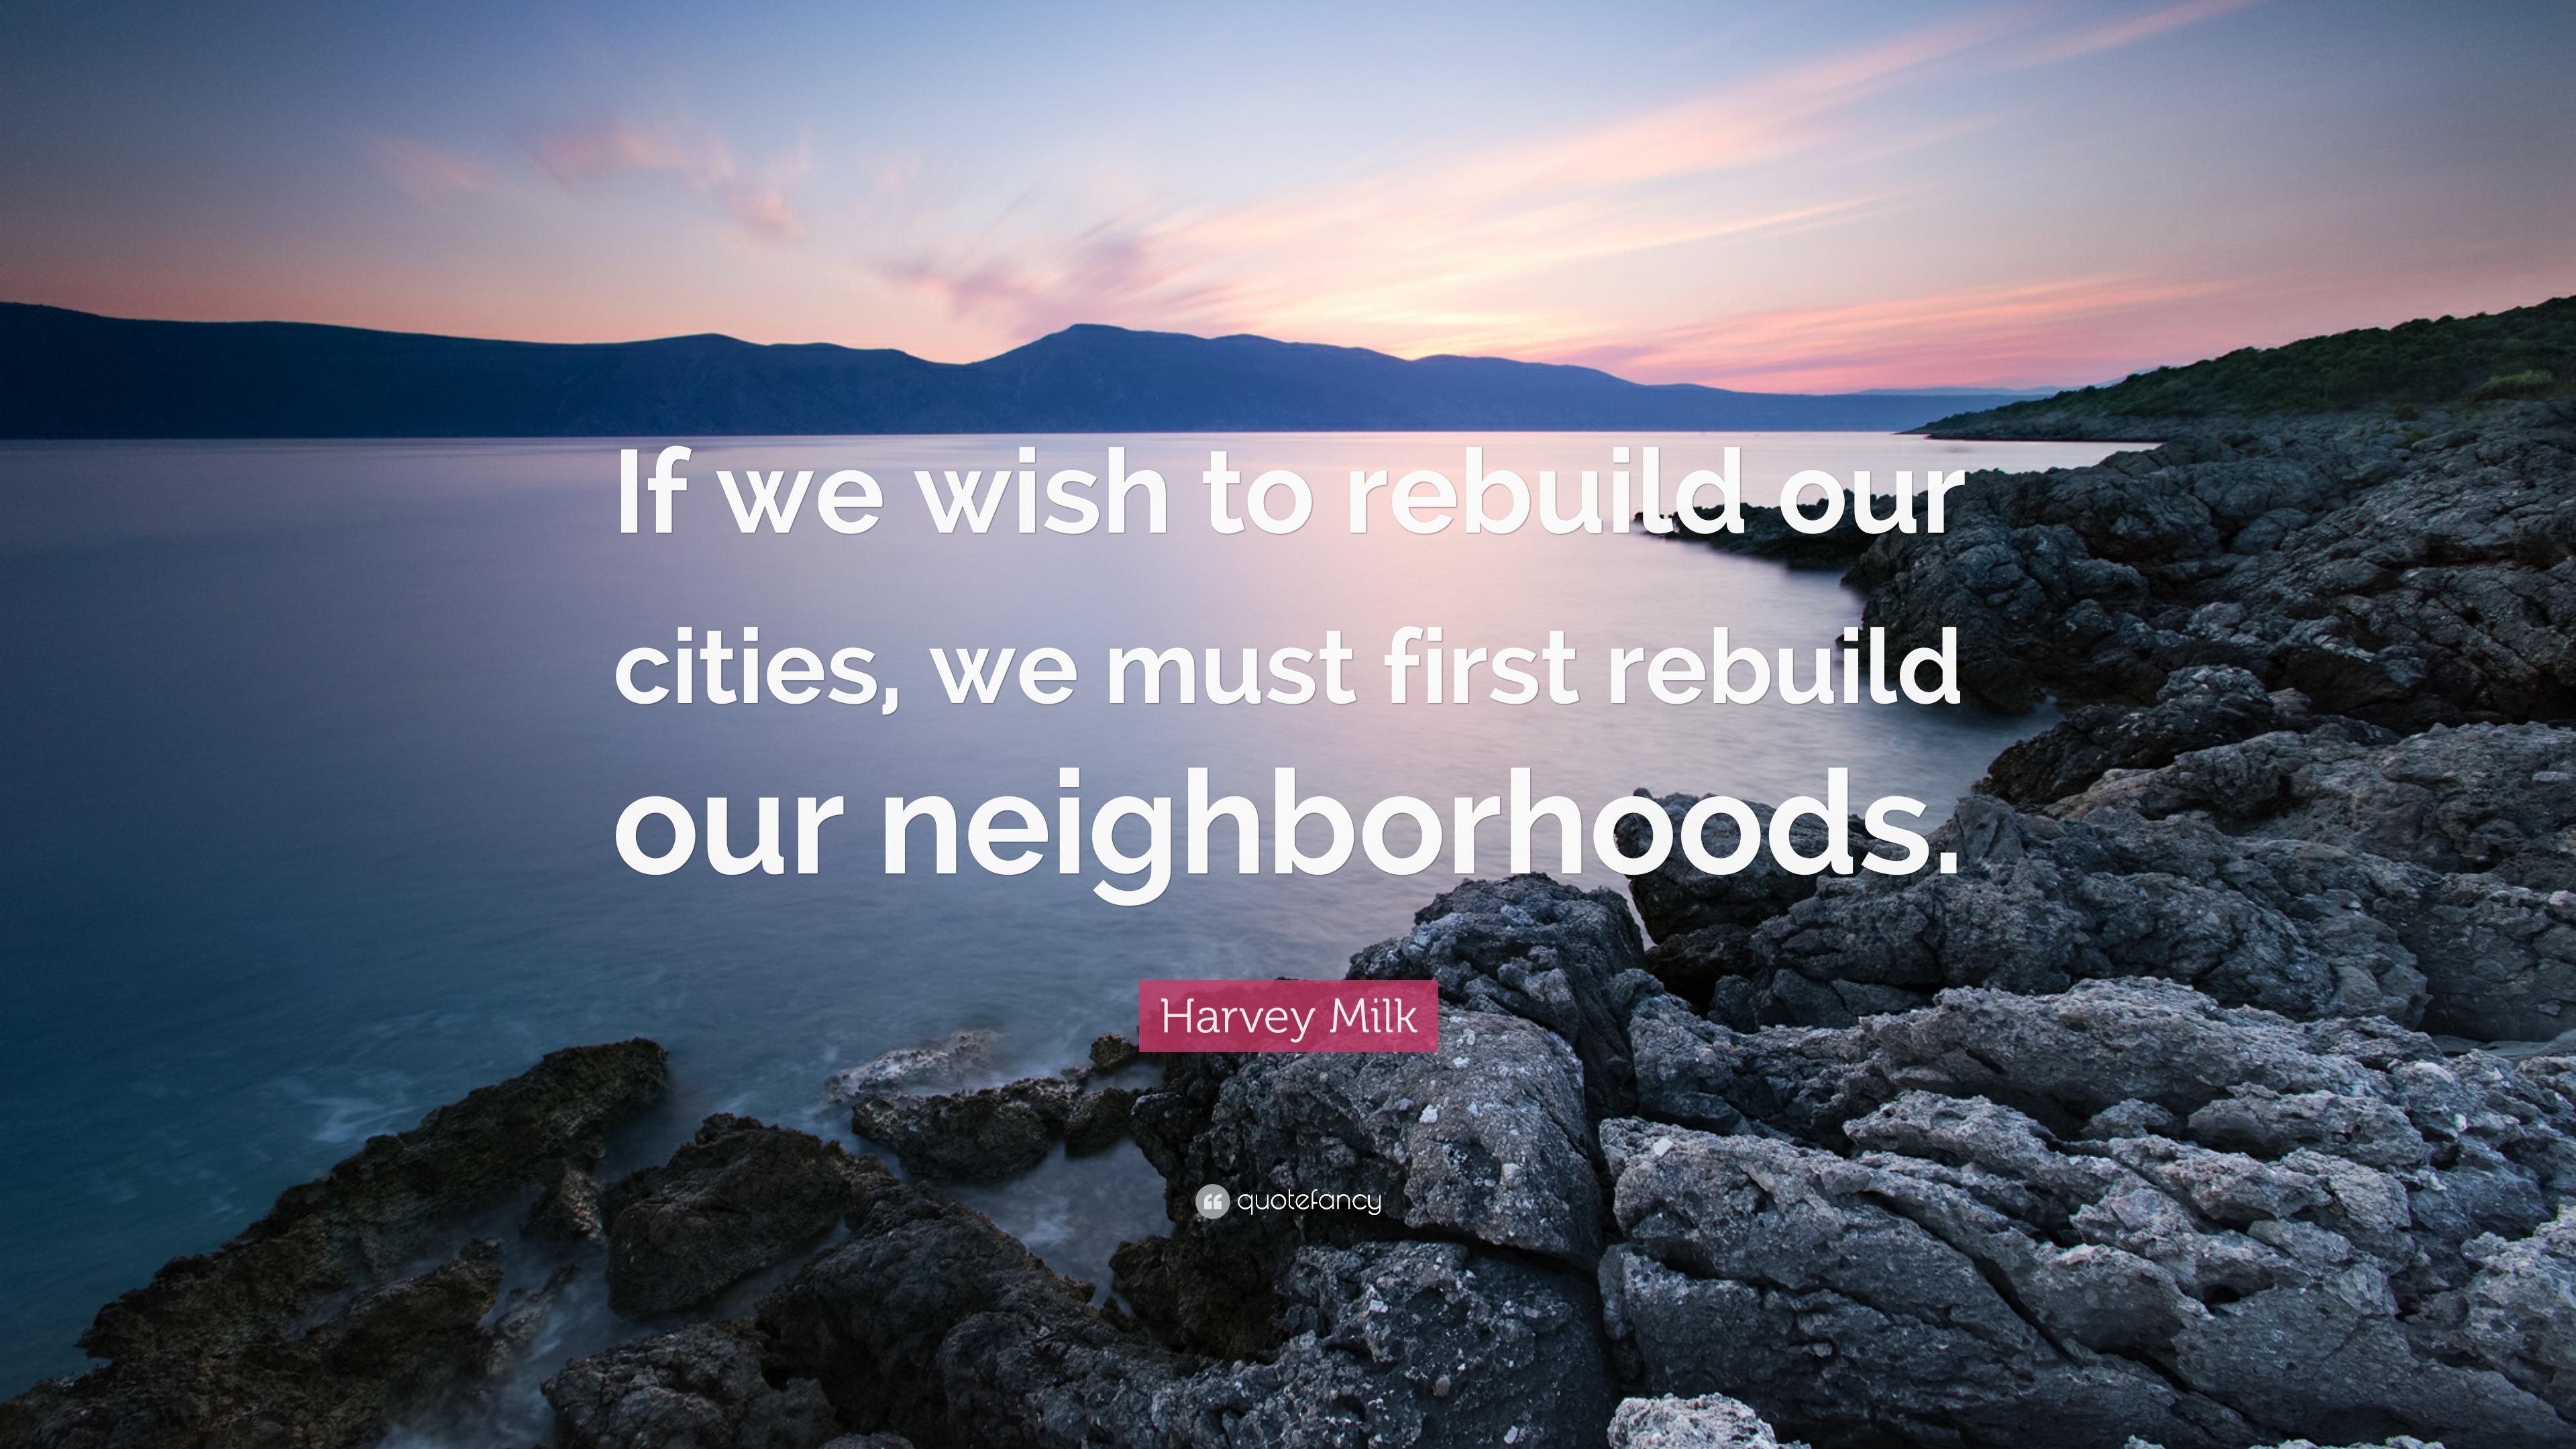 Harvey Milk Quote u201cIf we wish to